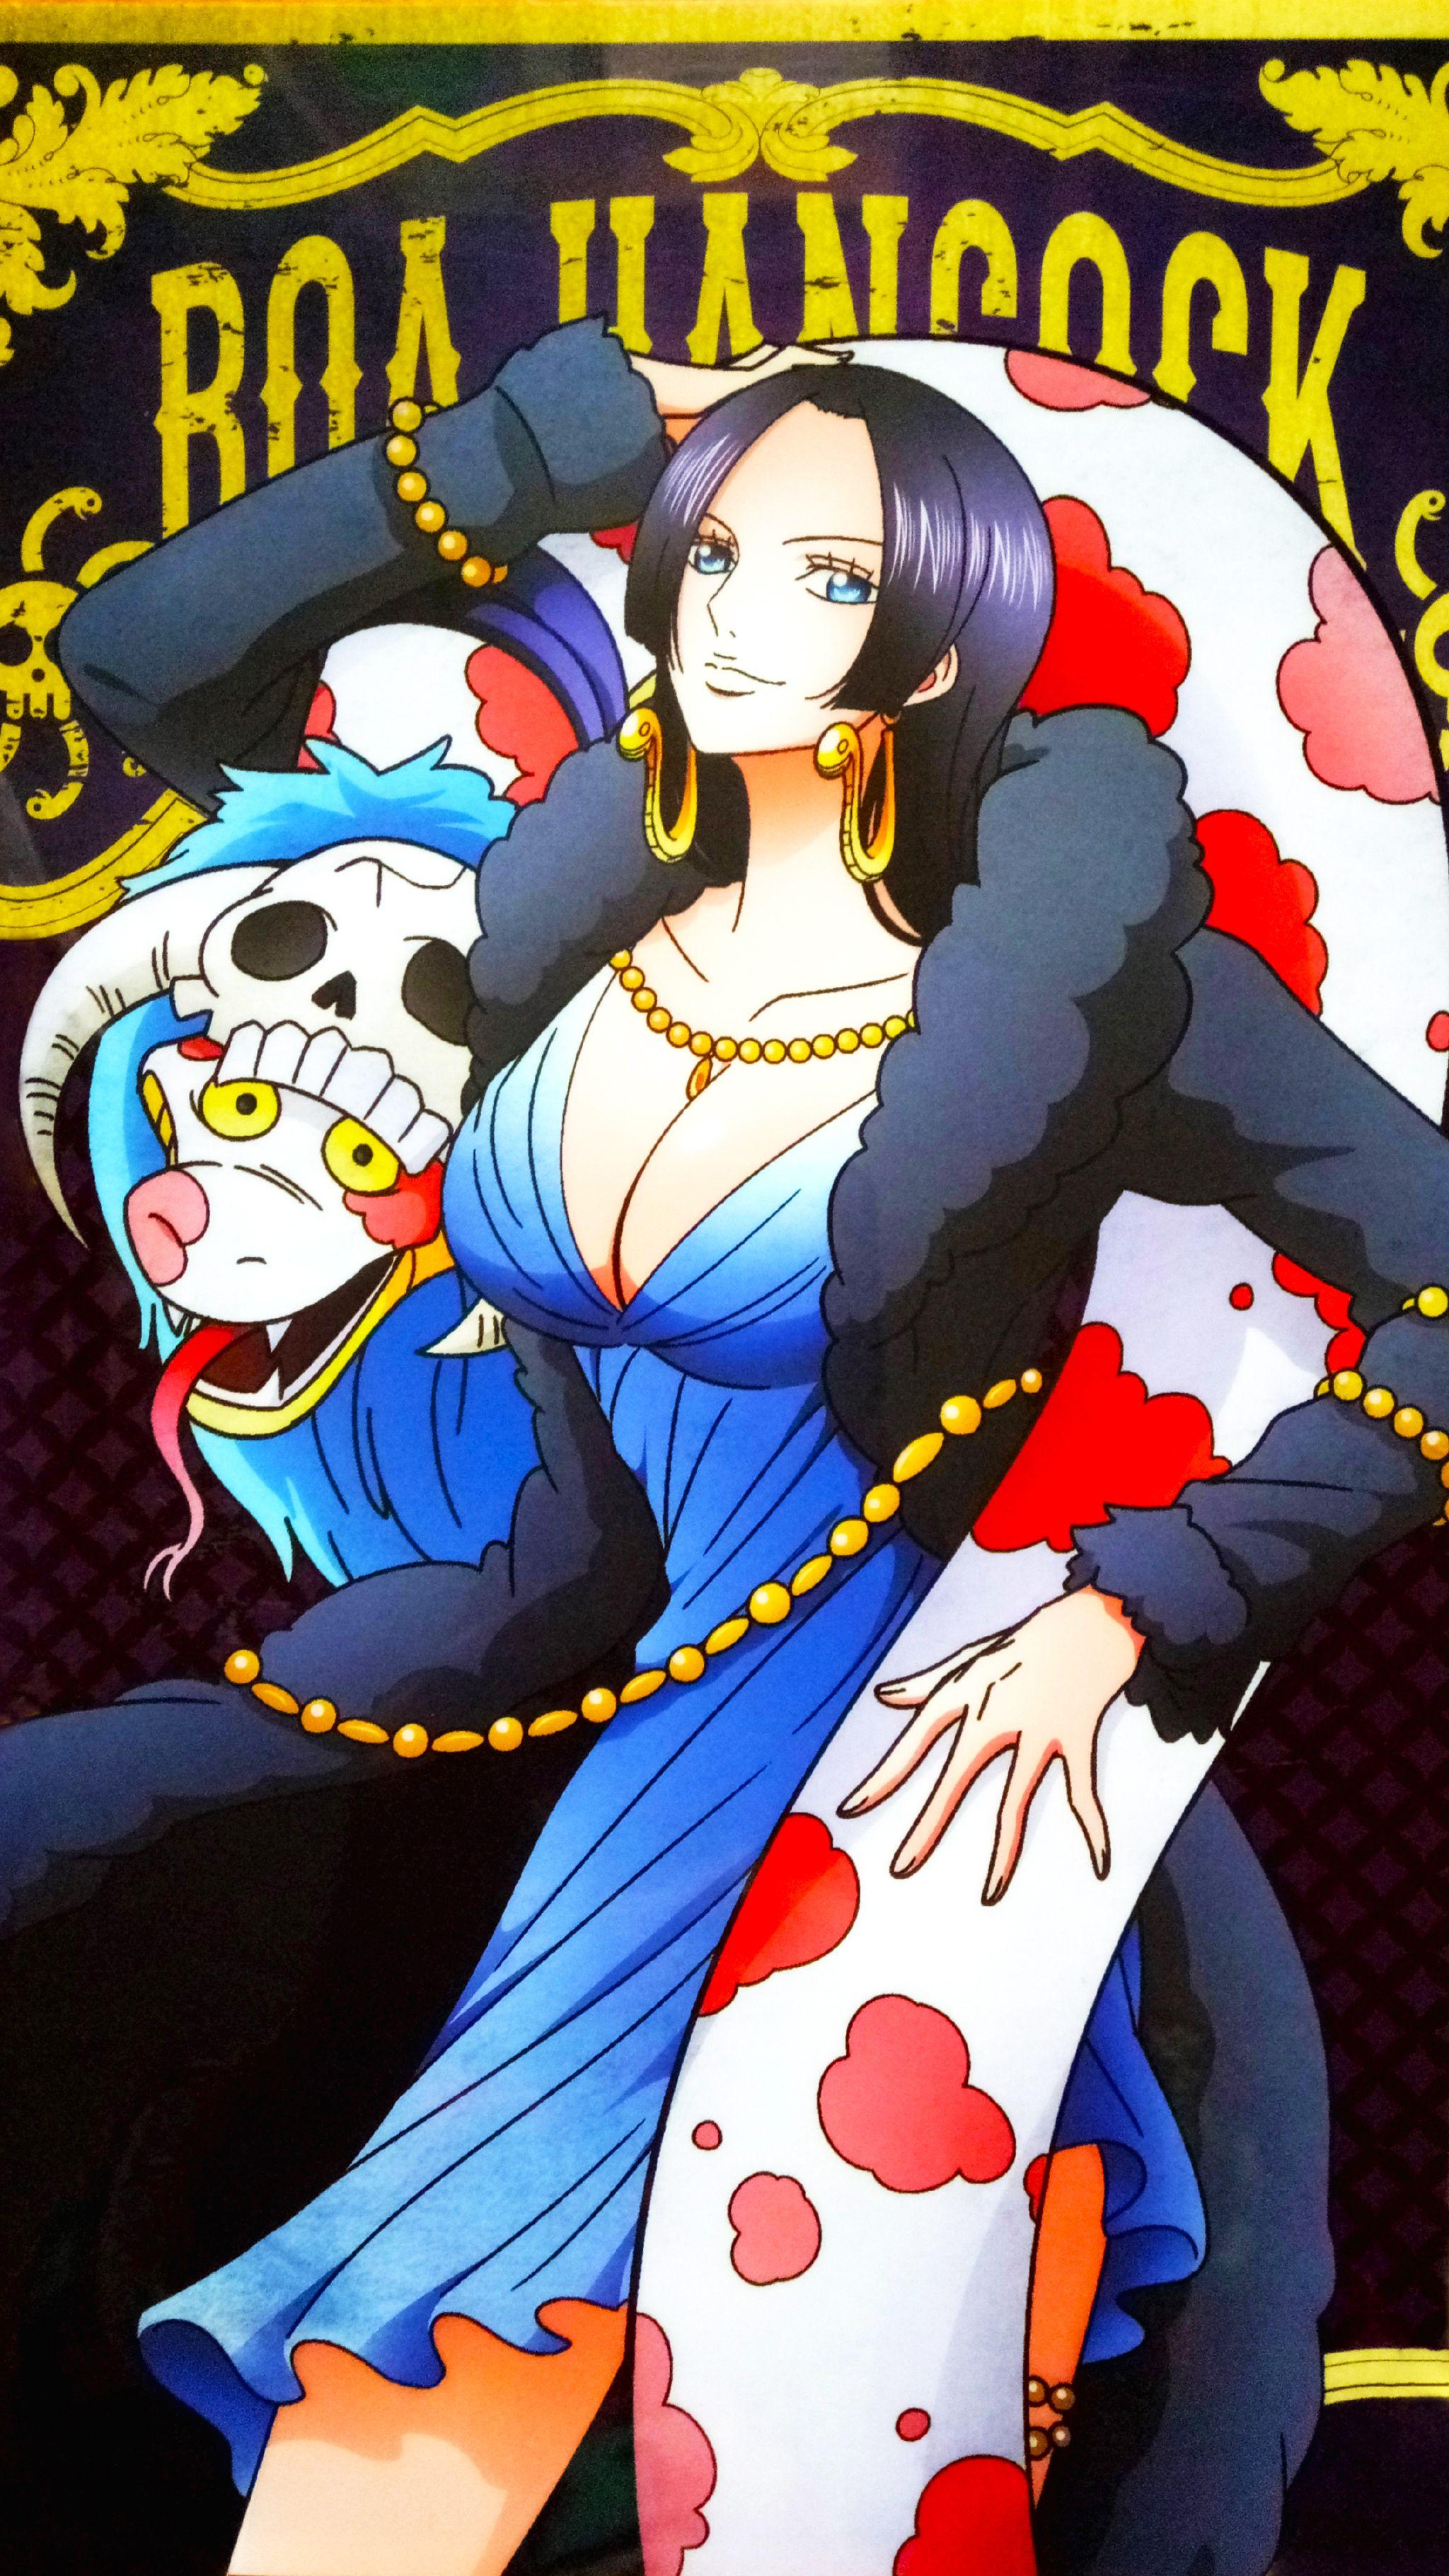 Boa hancock by lanahmd on deviantart in 2021 manga anime